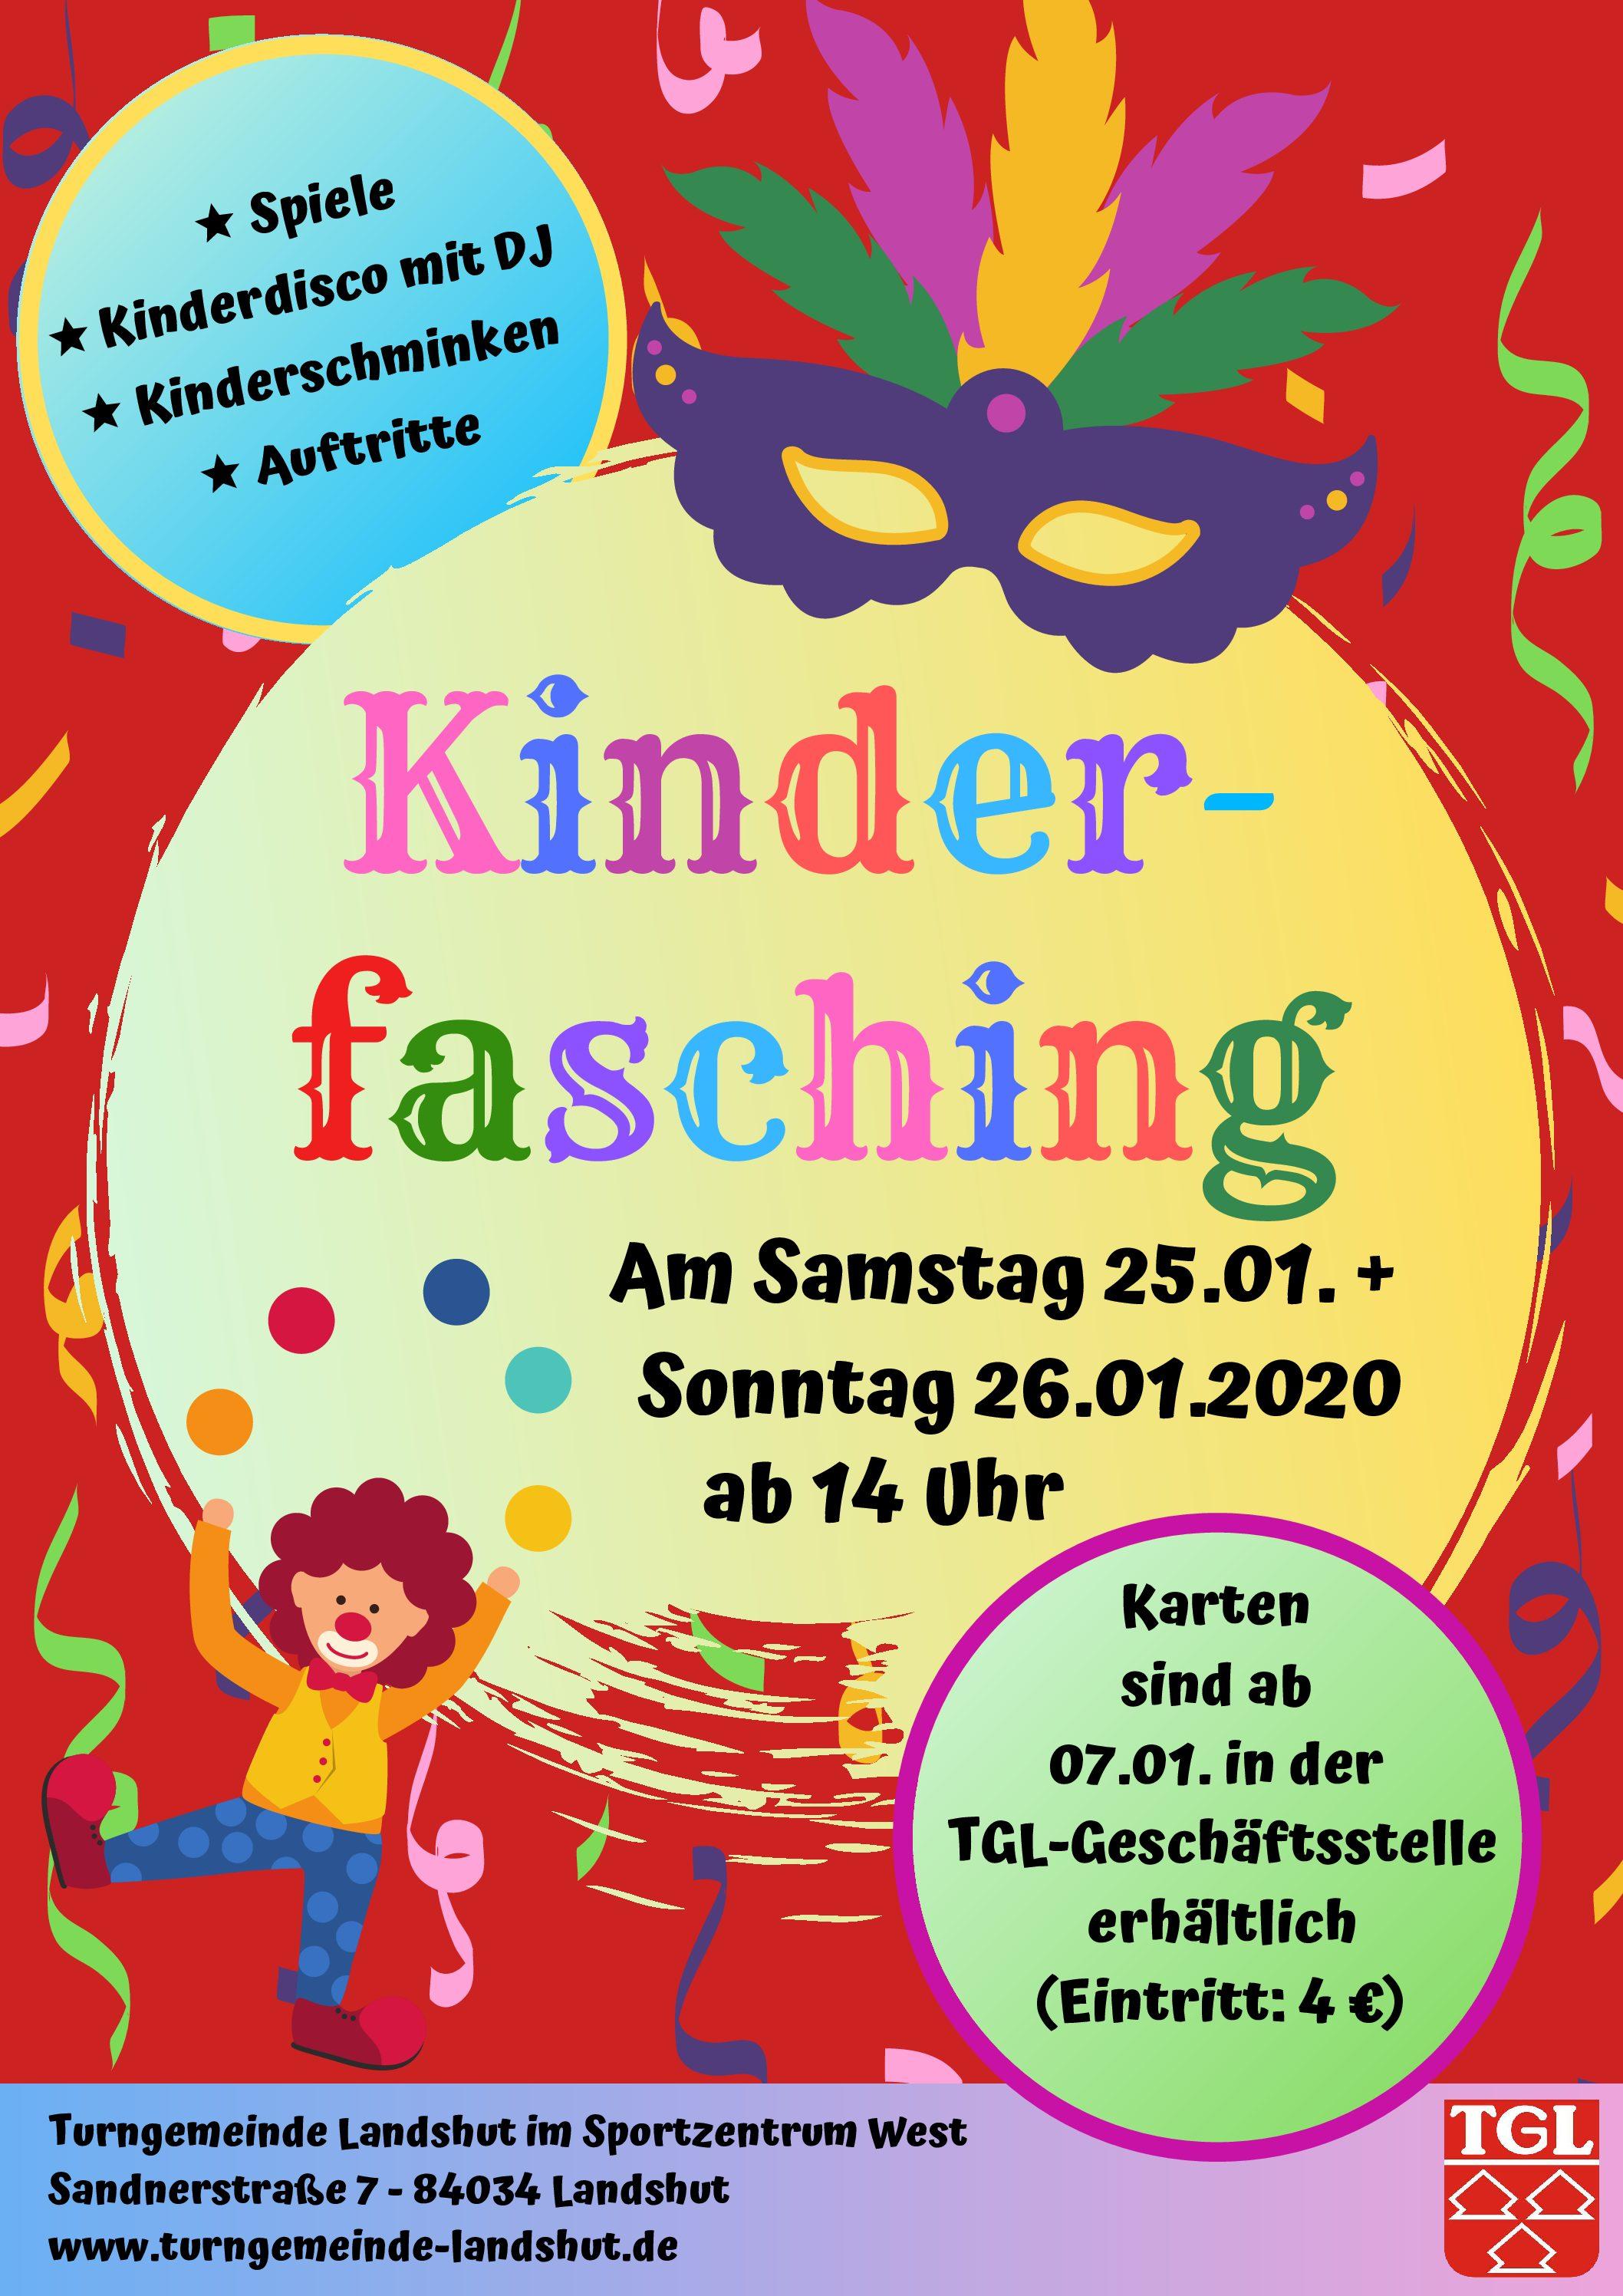 TGL-Kinderfasching: Beide Termine ausverkauft!